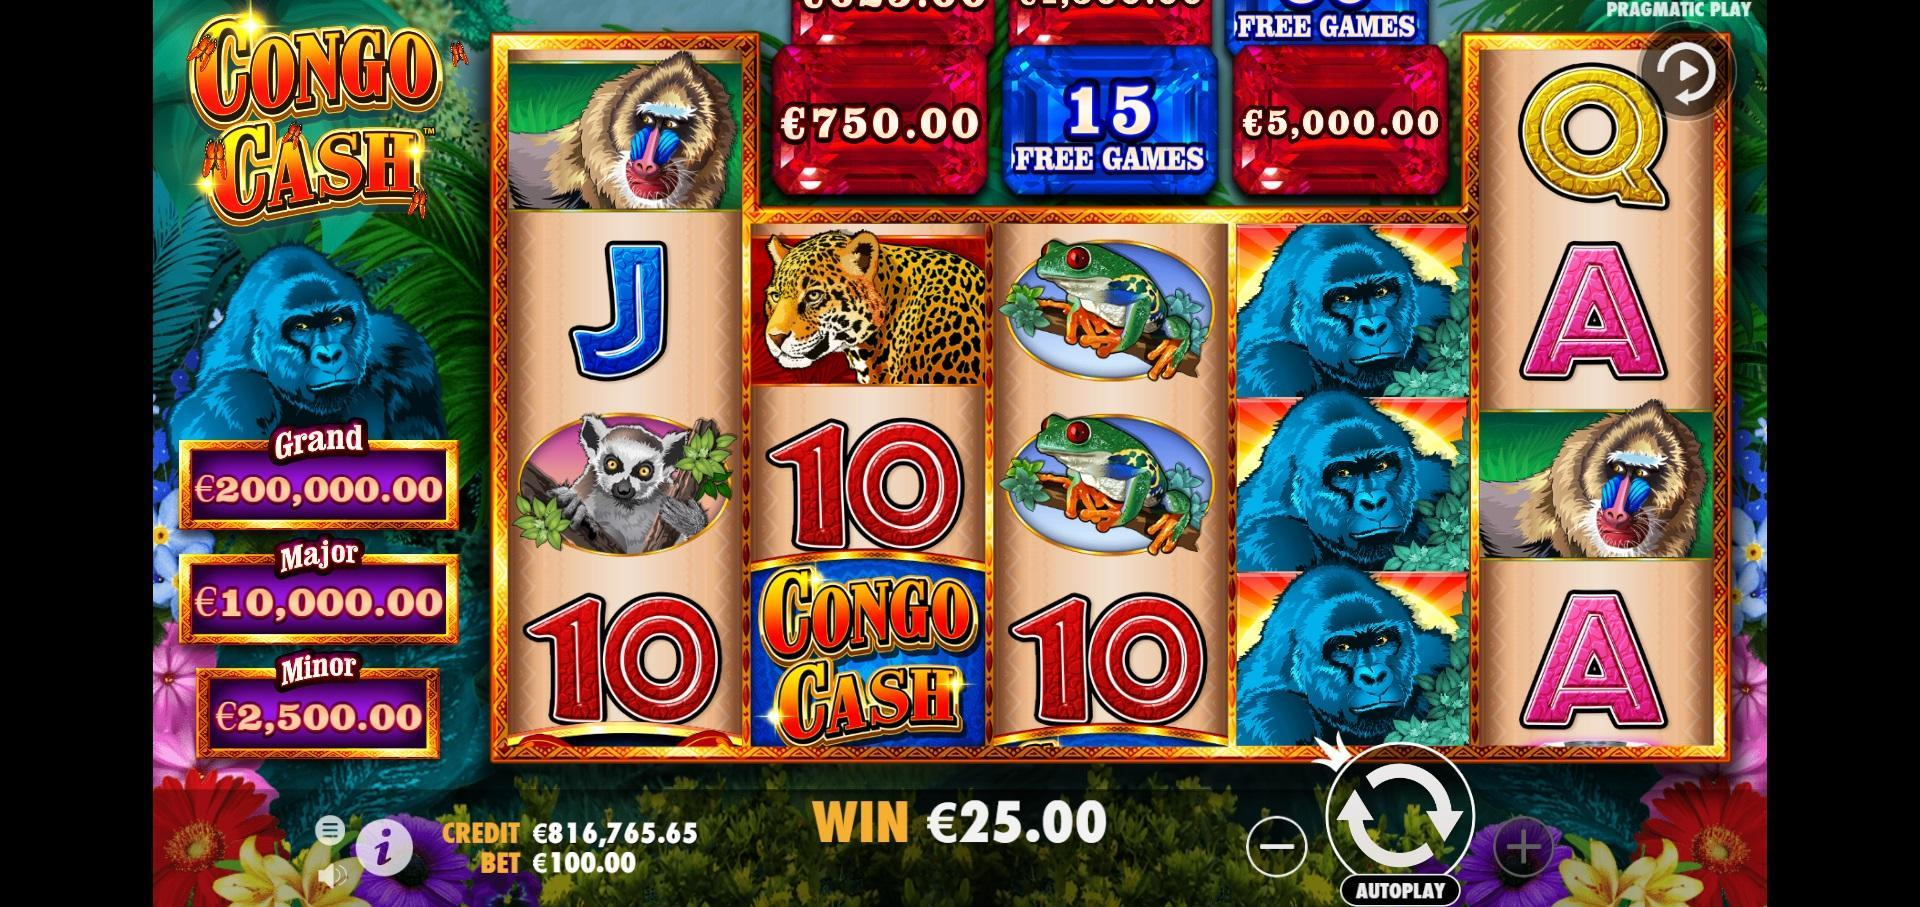 Congo Cash spillemaskine gameplay